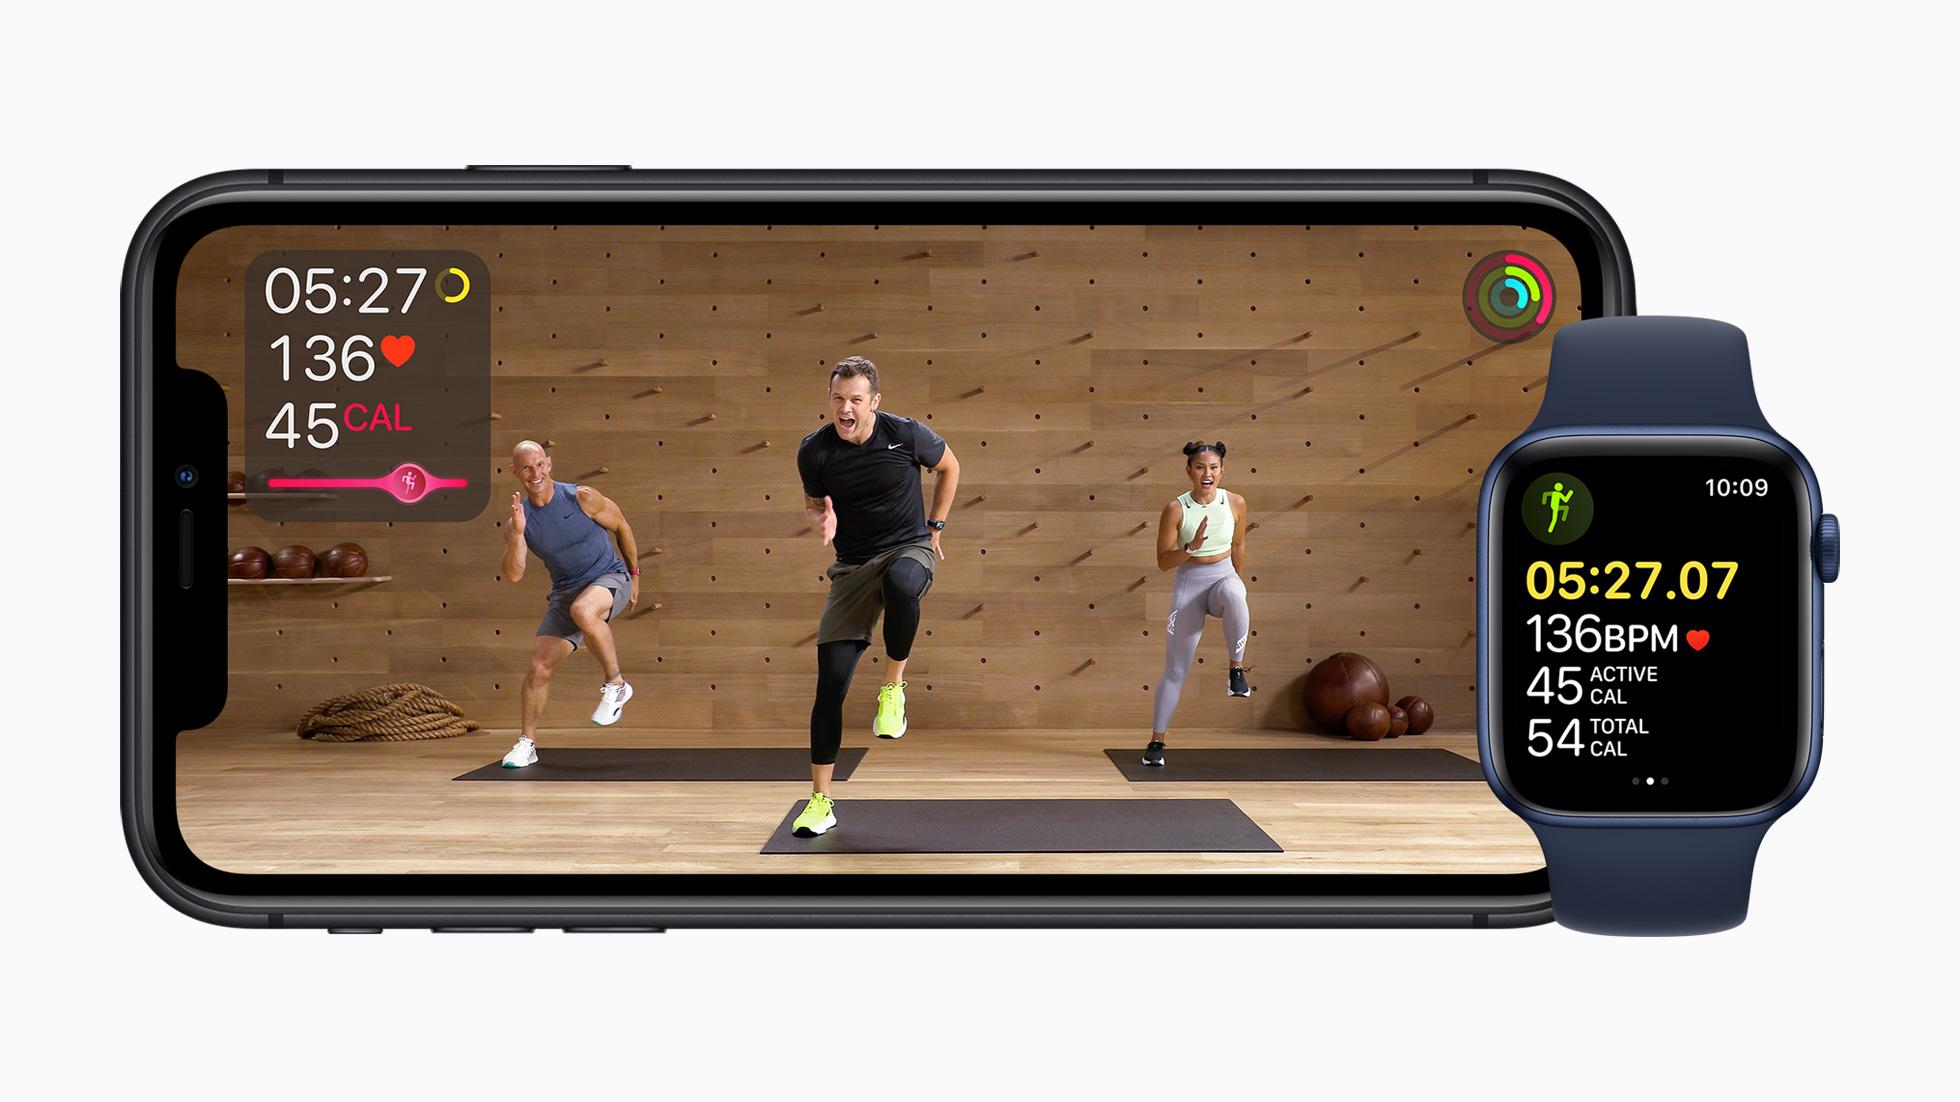 Apple_fitness-plus-iphone11-apple-watch-series-6_09152020_big.jpg.large_2x.jpg (386.0 kB)